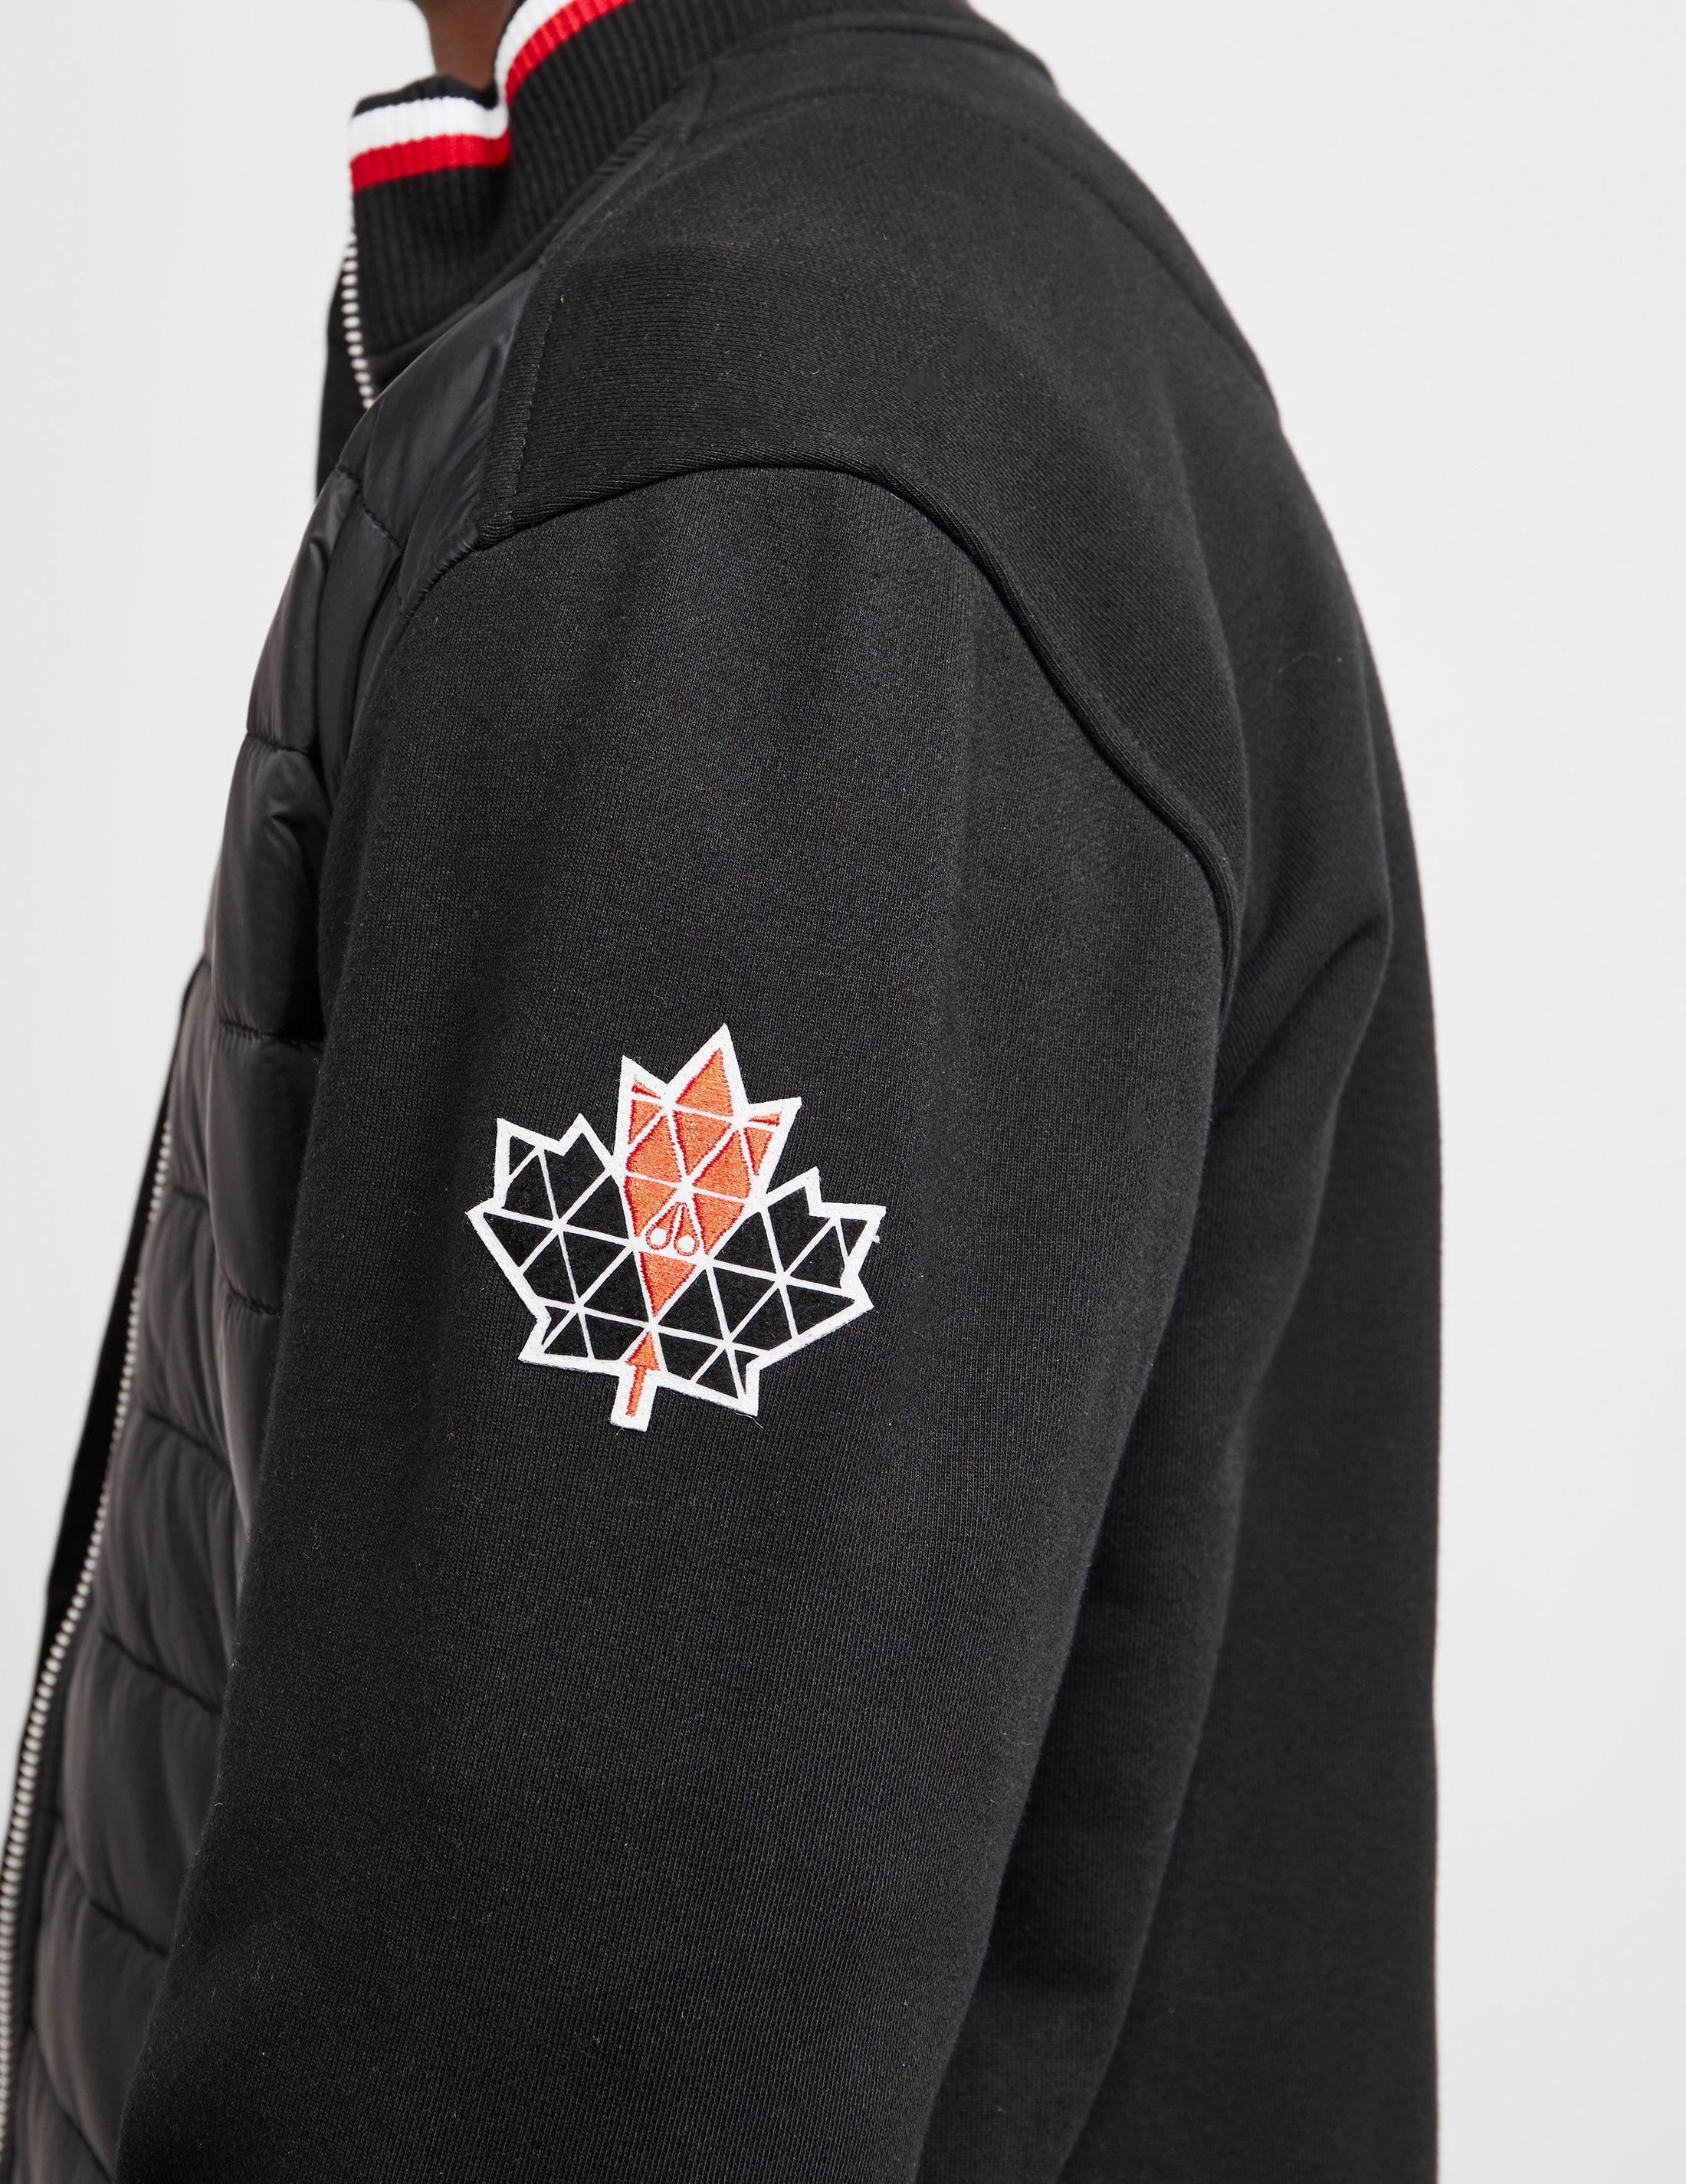 Moose Knuckles Quilted Bomber Jacket